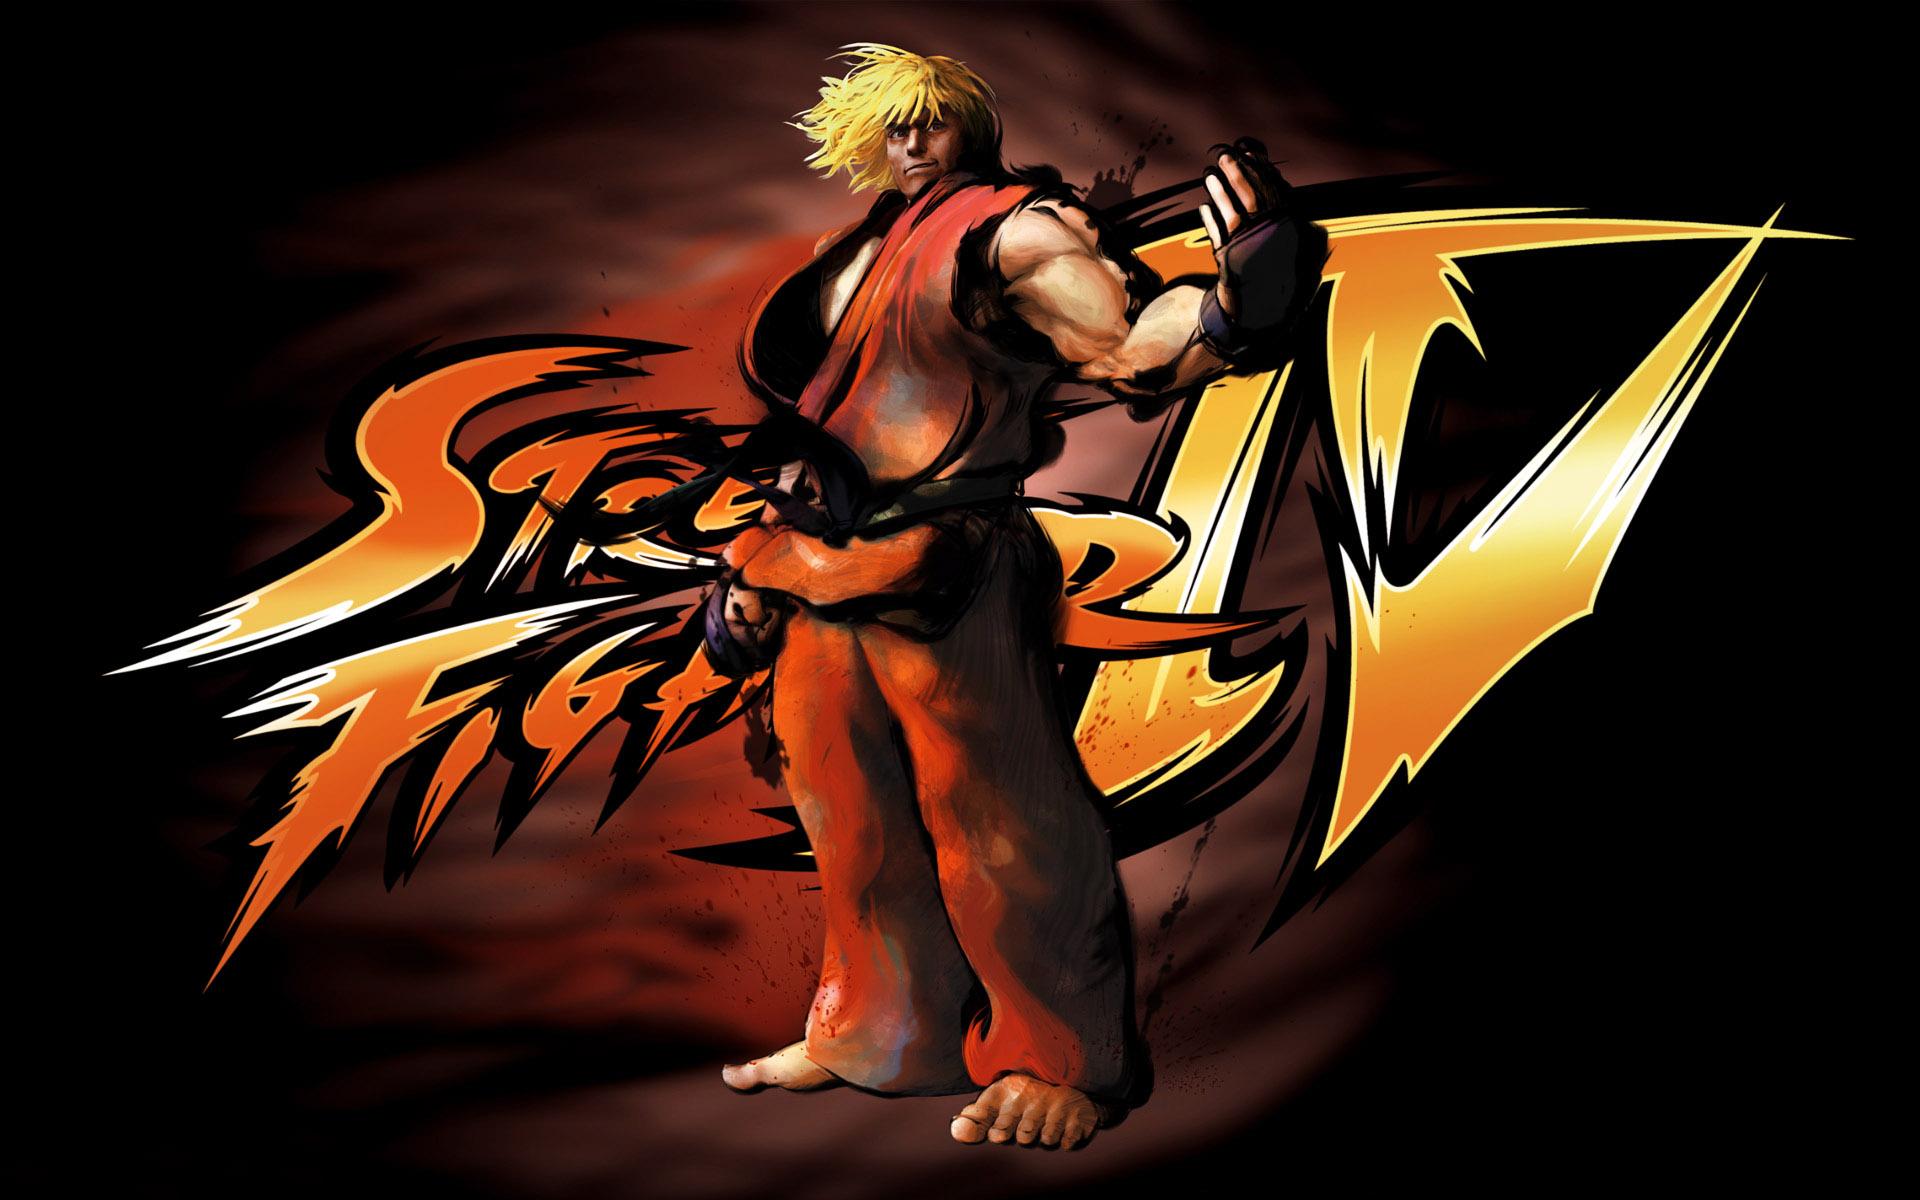 Street Fighter 4 Wallpapers: Ken Street Fighter Wallpaper